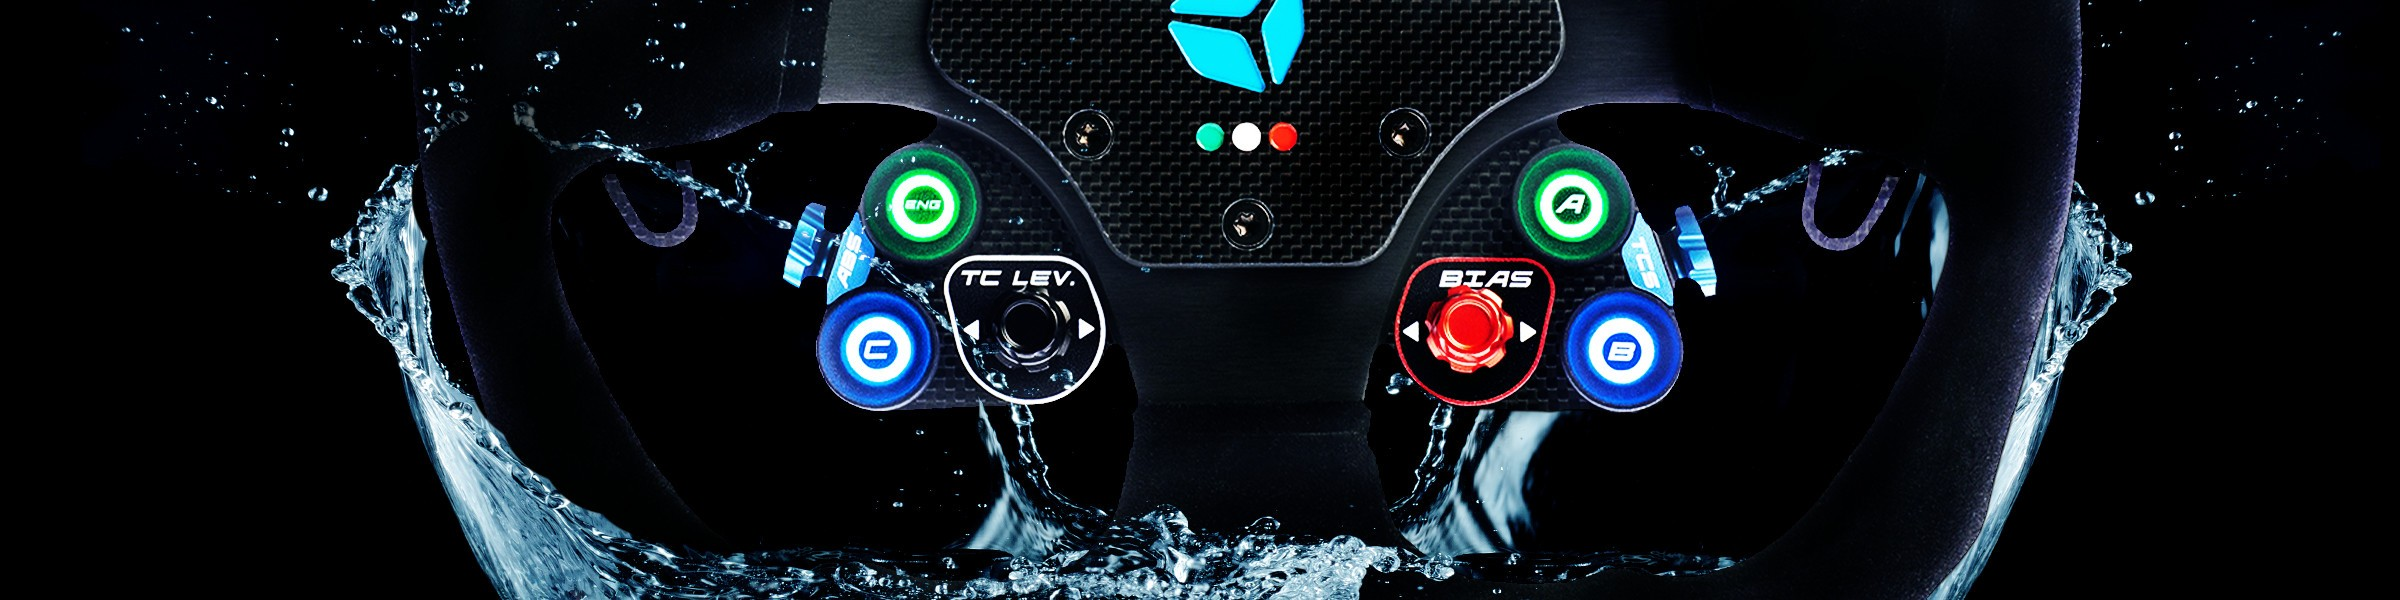 shop.gperformance.eu - Cube Controls GT Pro MOMO - G-Performance